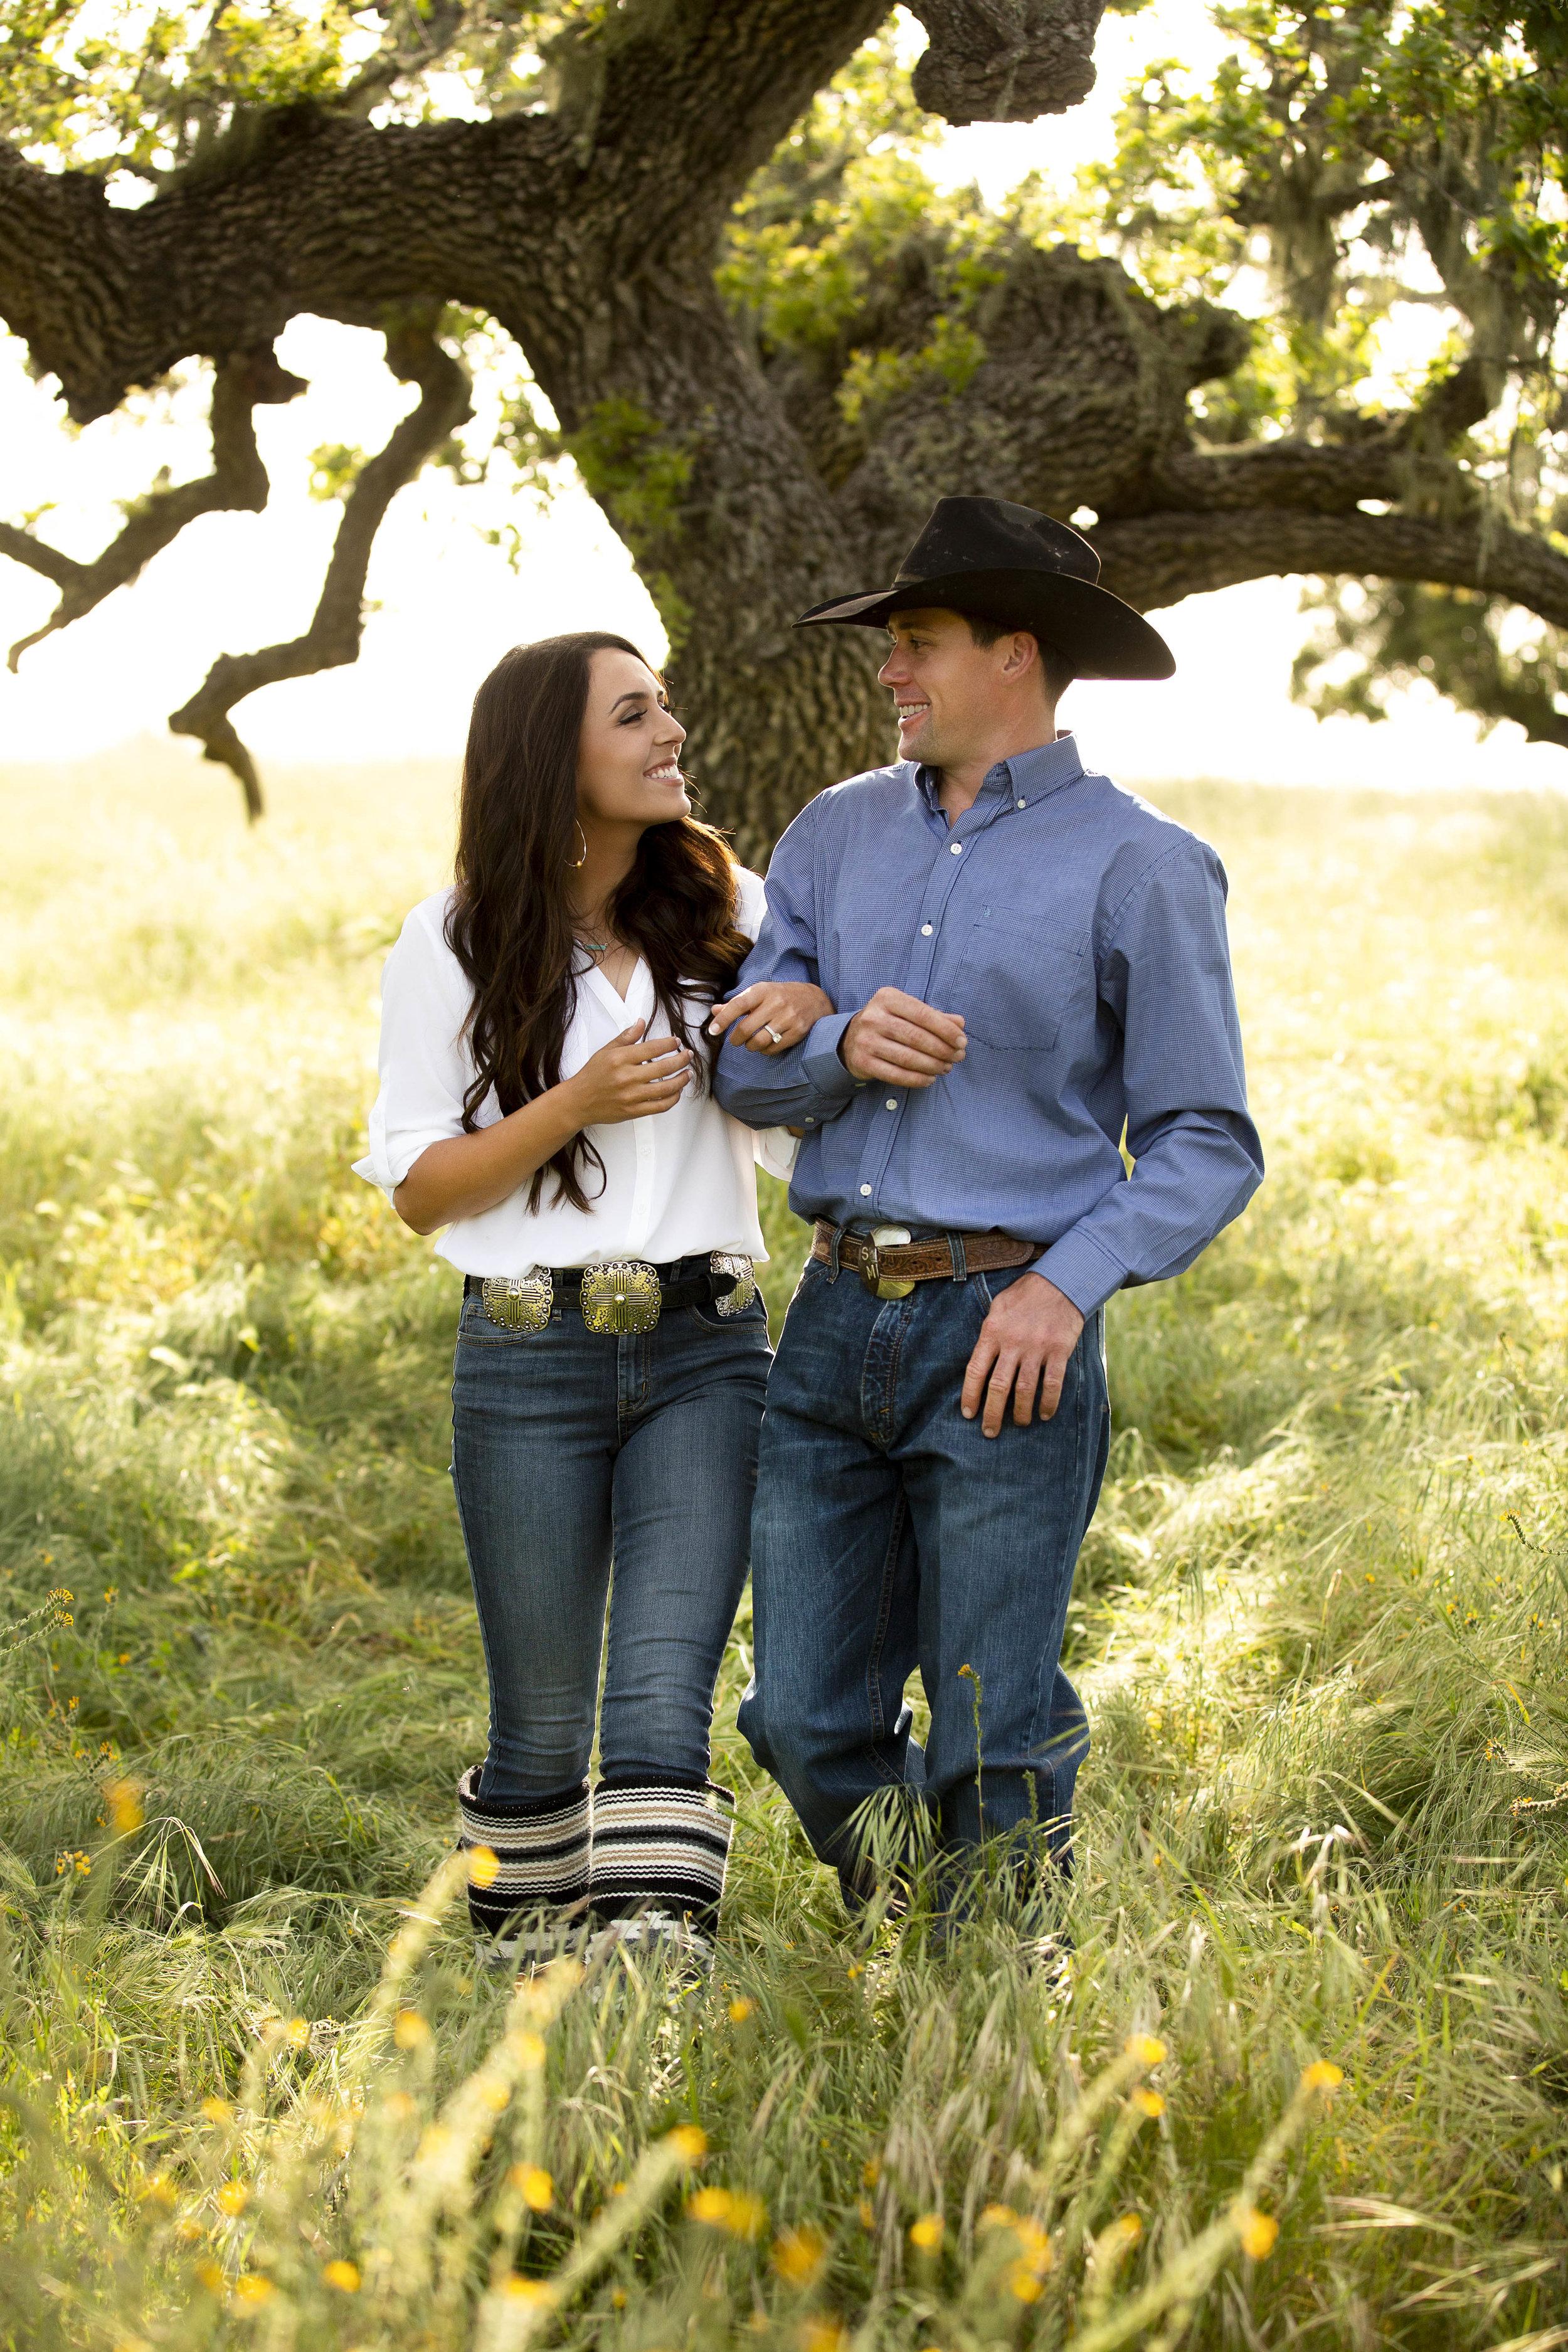 Shawnee&Michaela_BlogPost-2.jpg